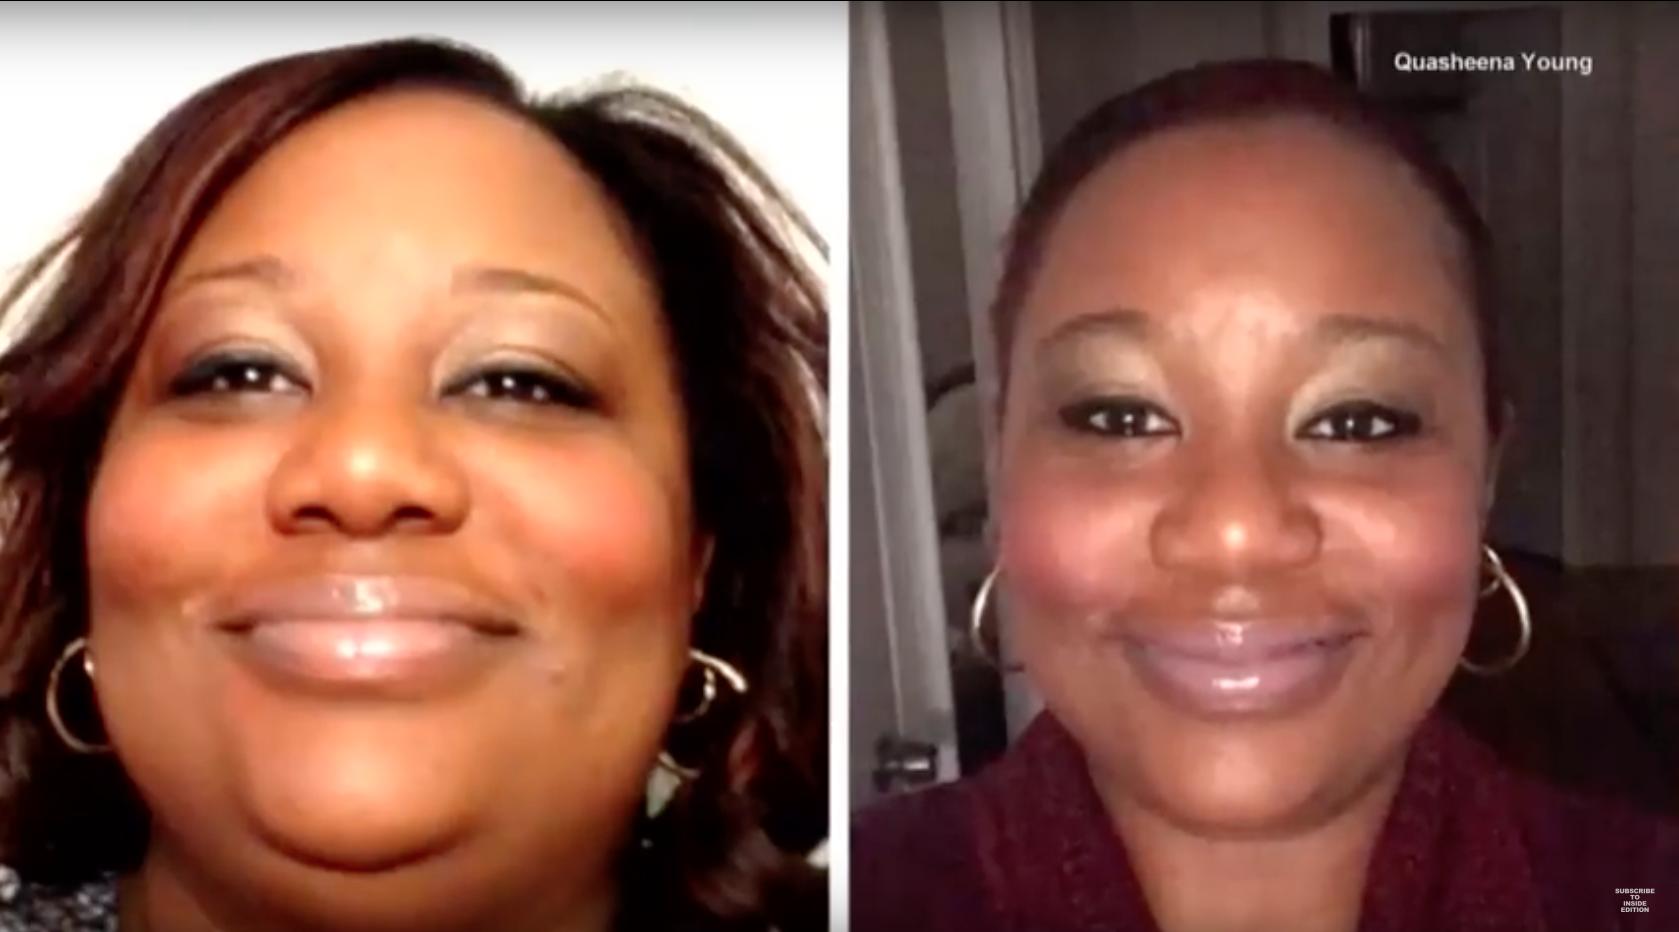 weight loss success story Quasheena Young